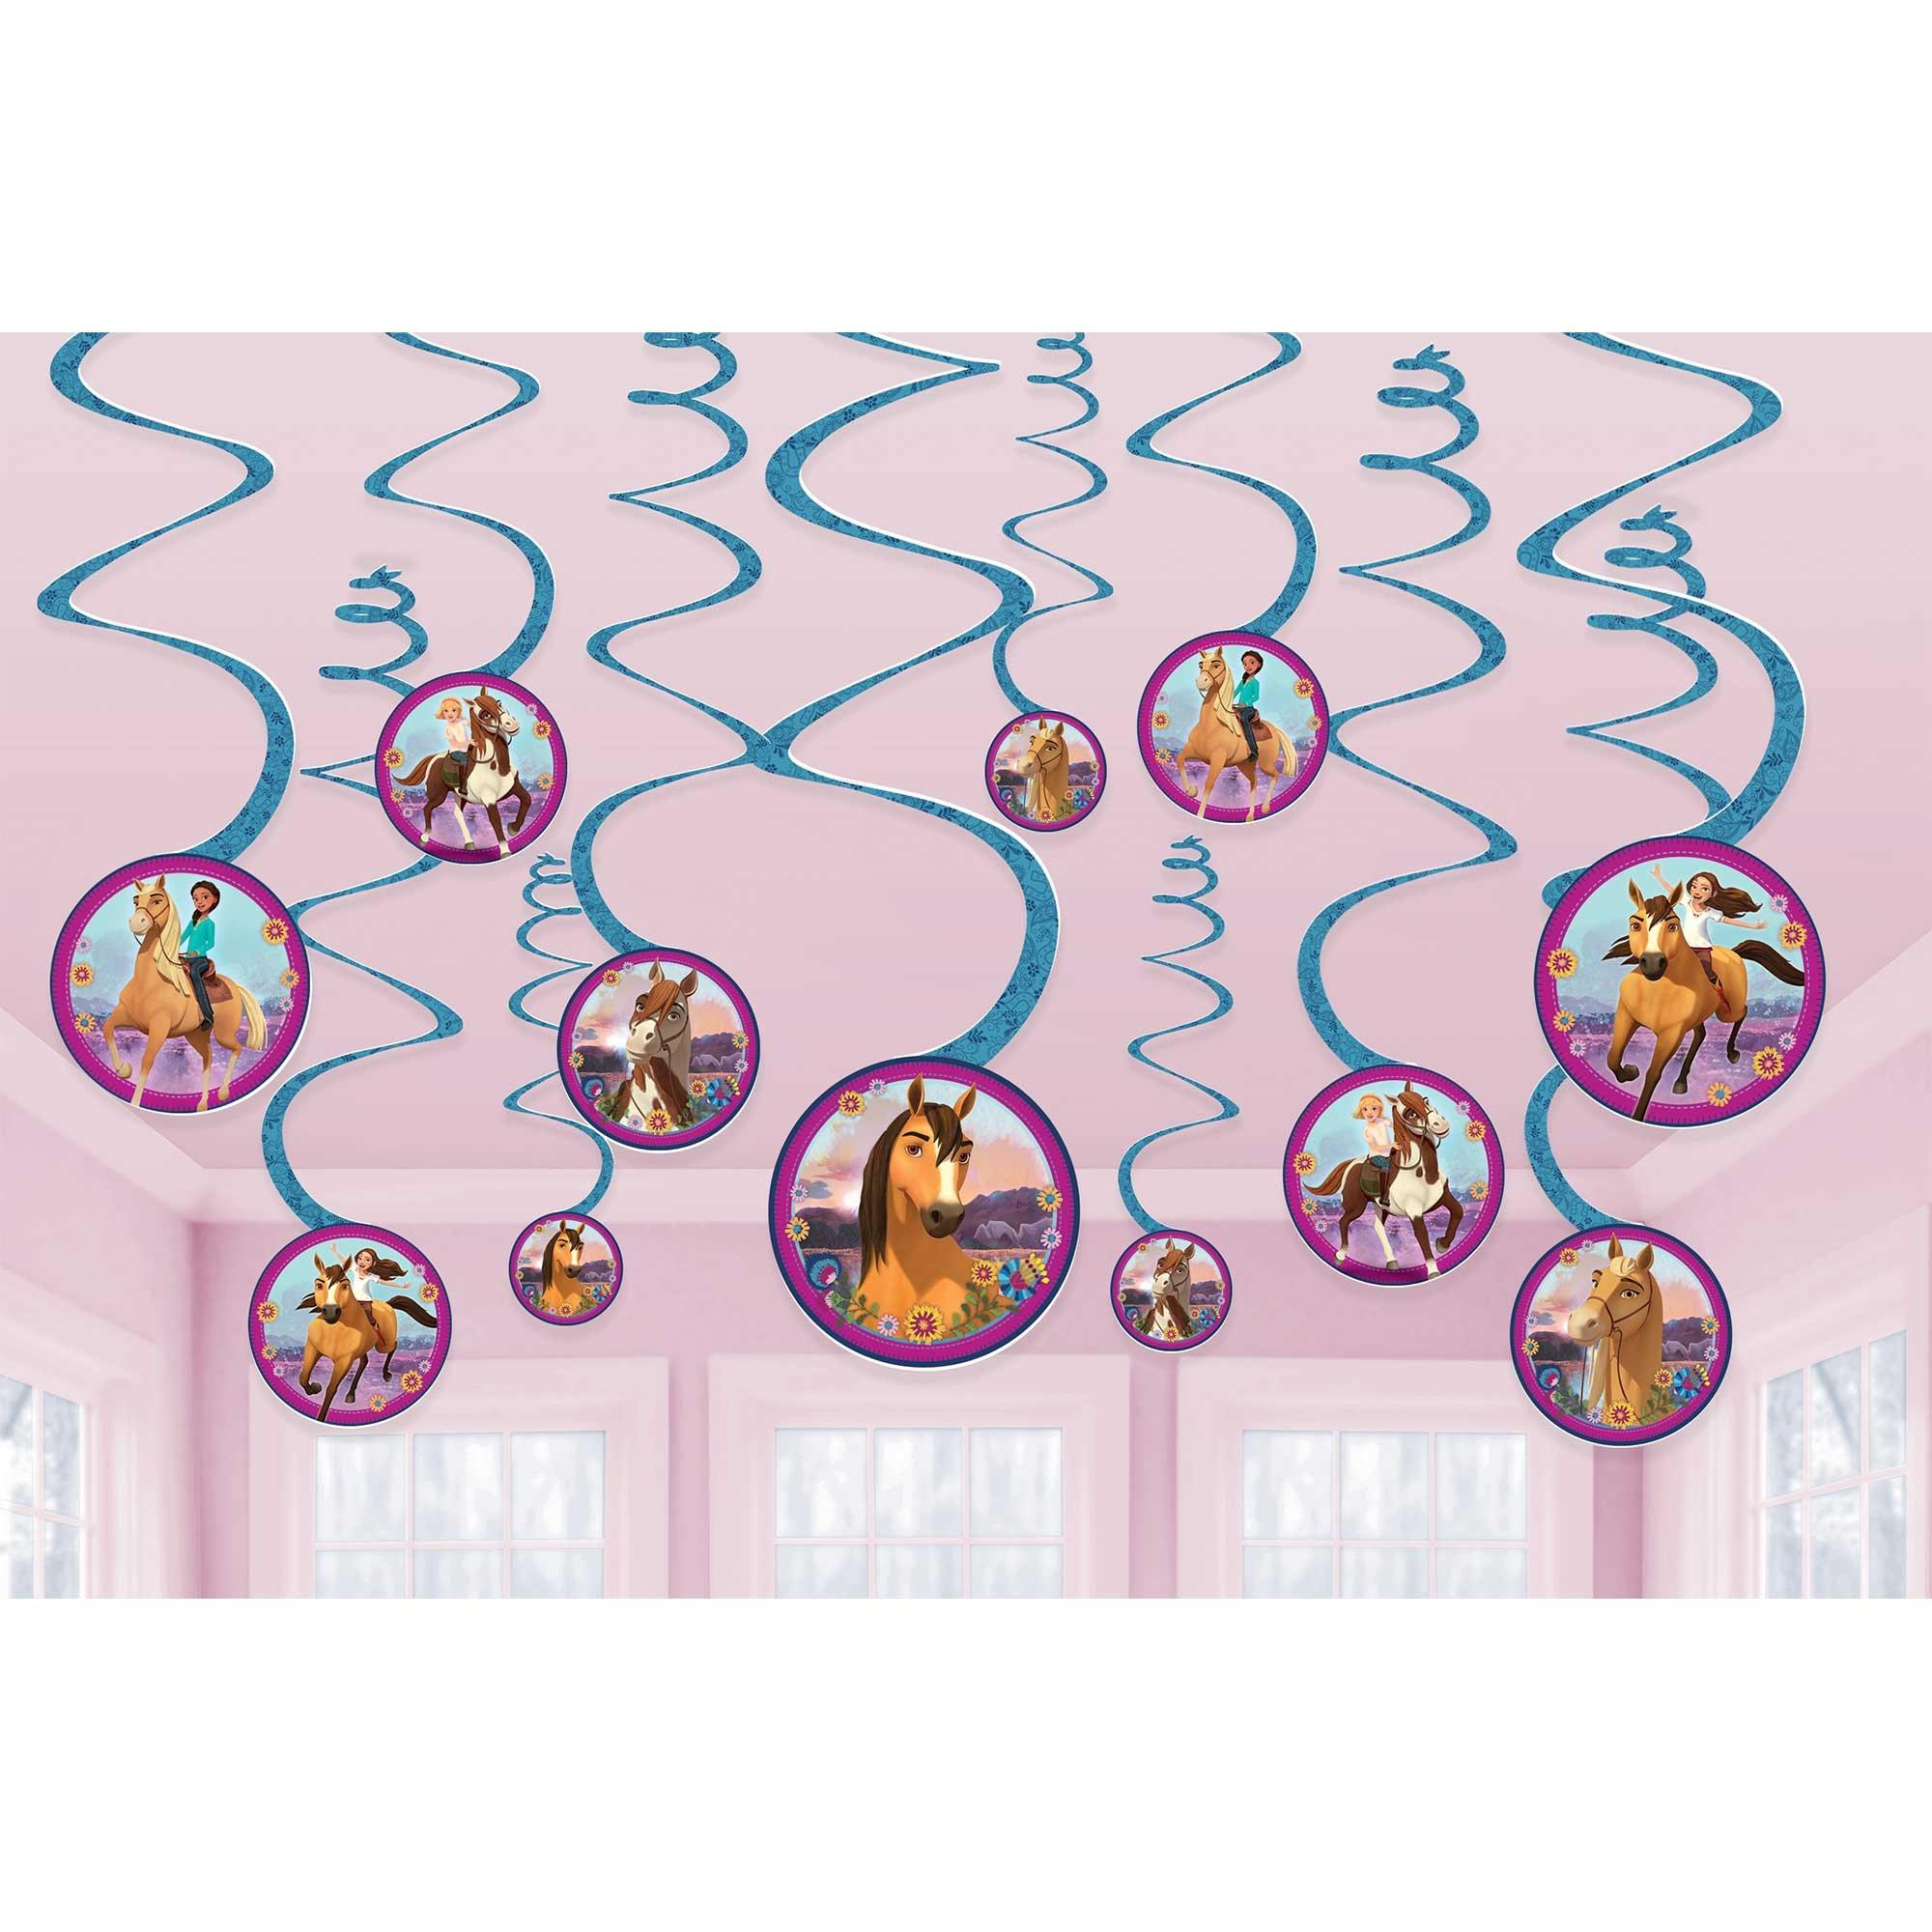 Spirit Riding Free Spiral Swirls Hanging Decorations